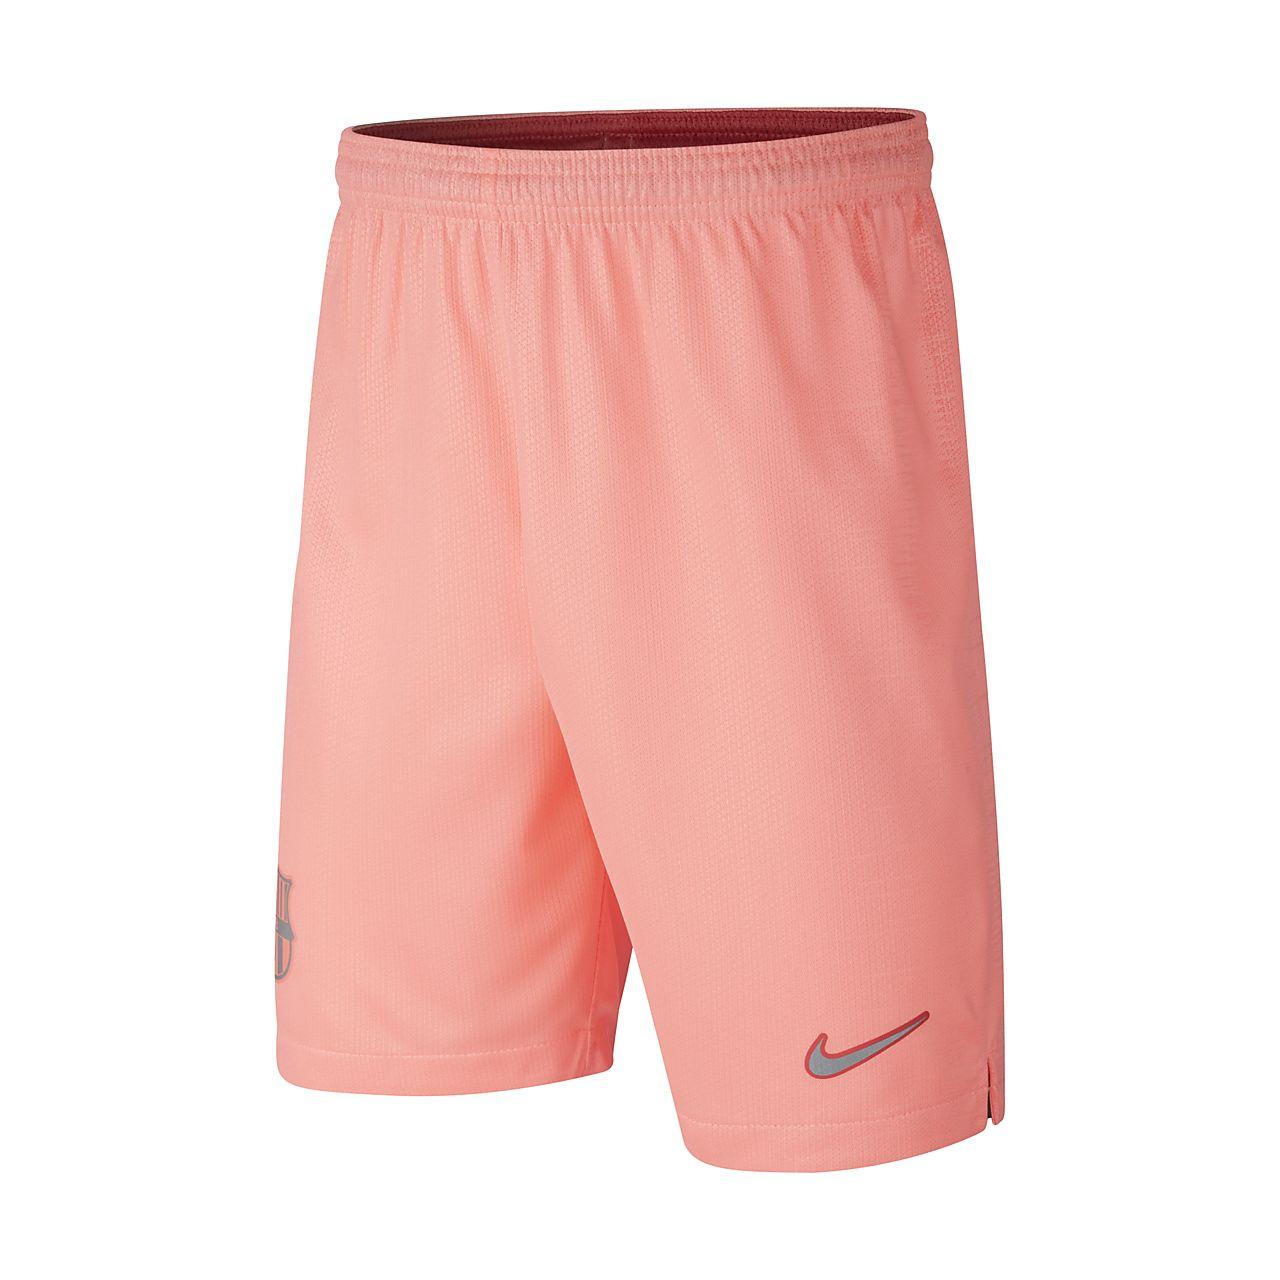 Shorts de fútbol para niños talla grande 2018/19 FC Barcelona Stadium Third